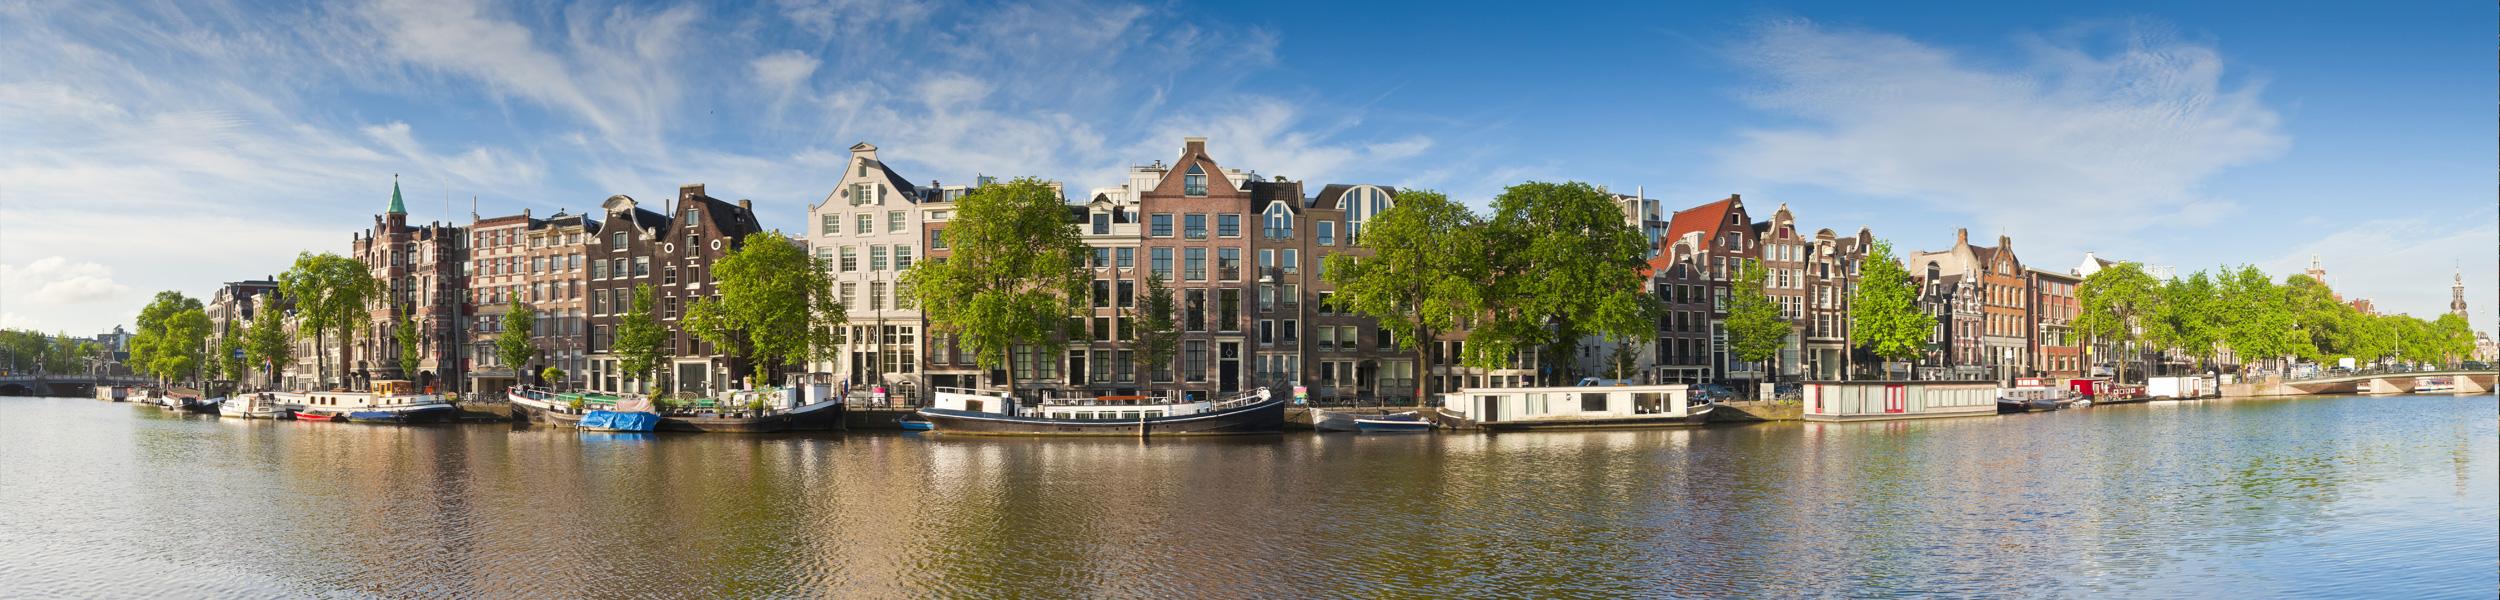 QA Engineer Amsterdam, the Netherlands